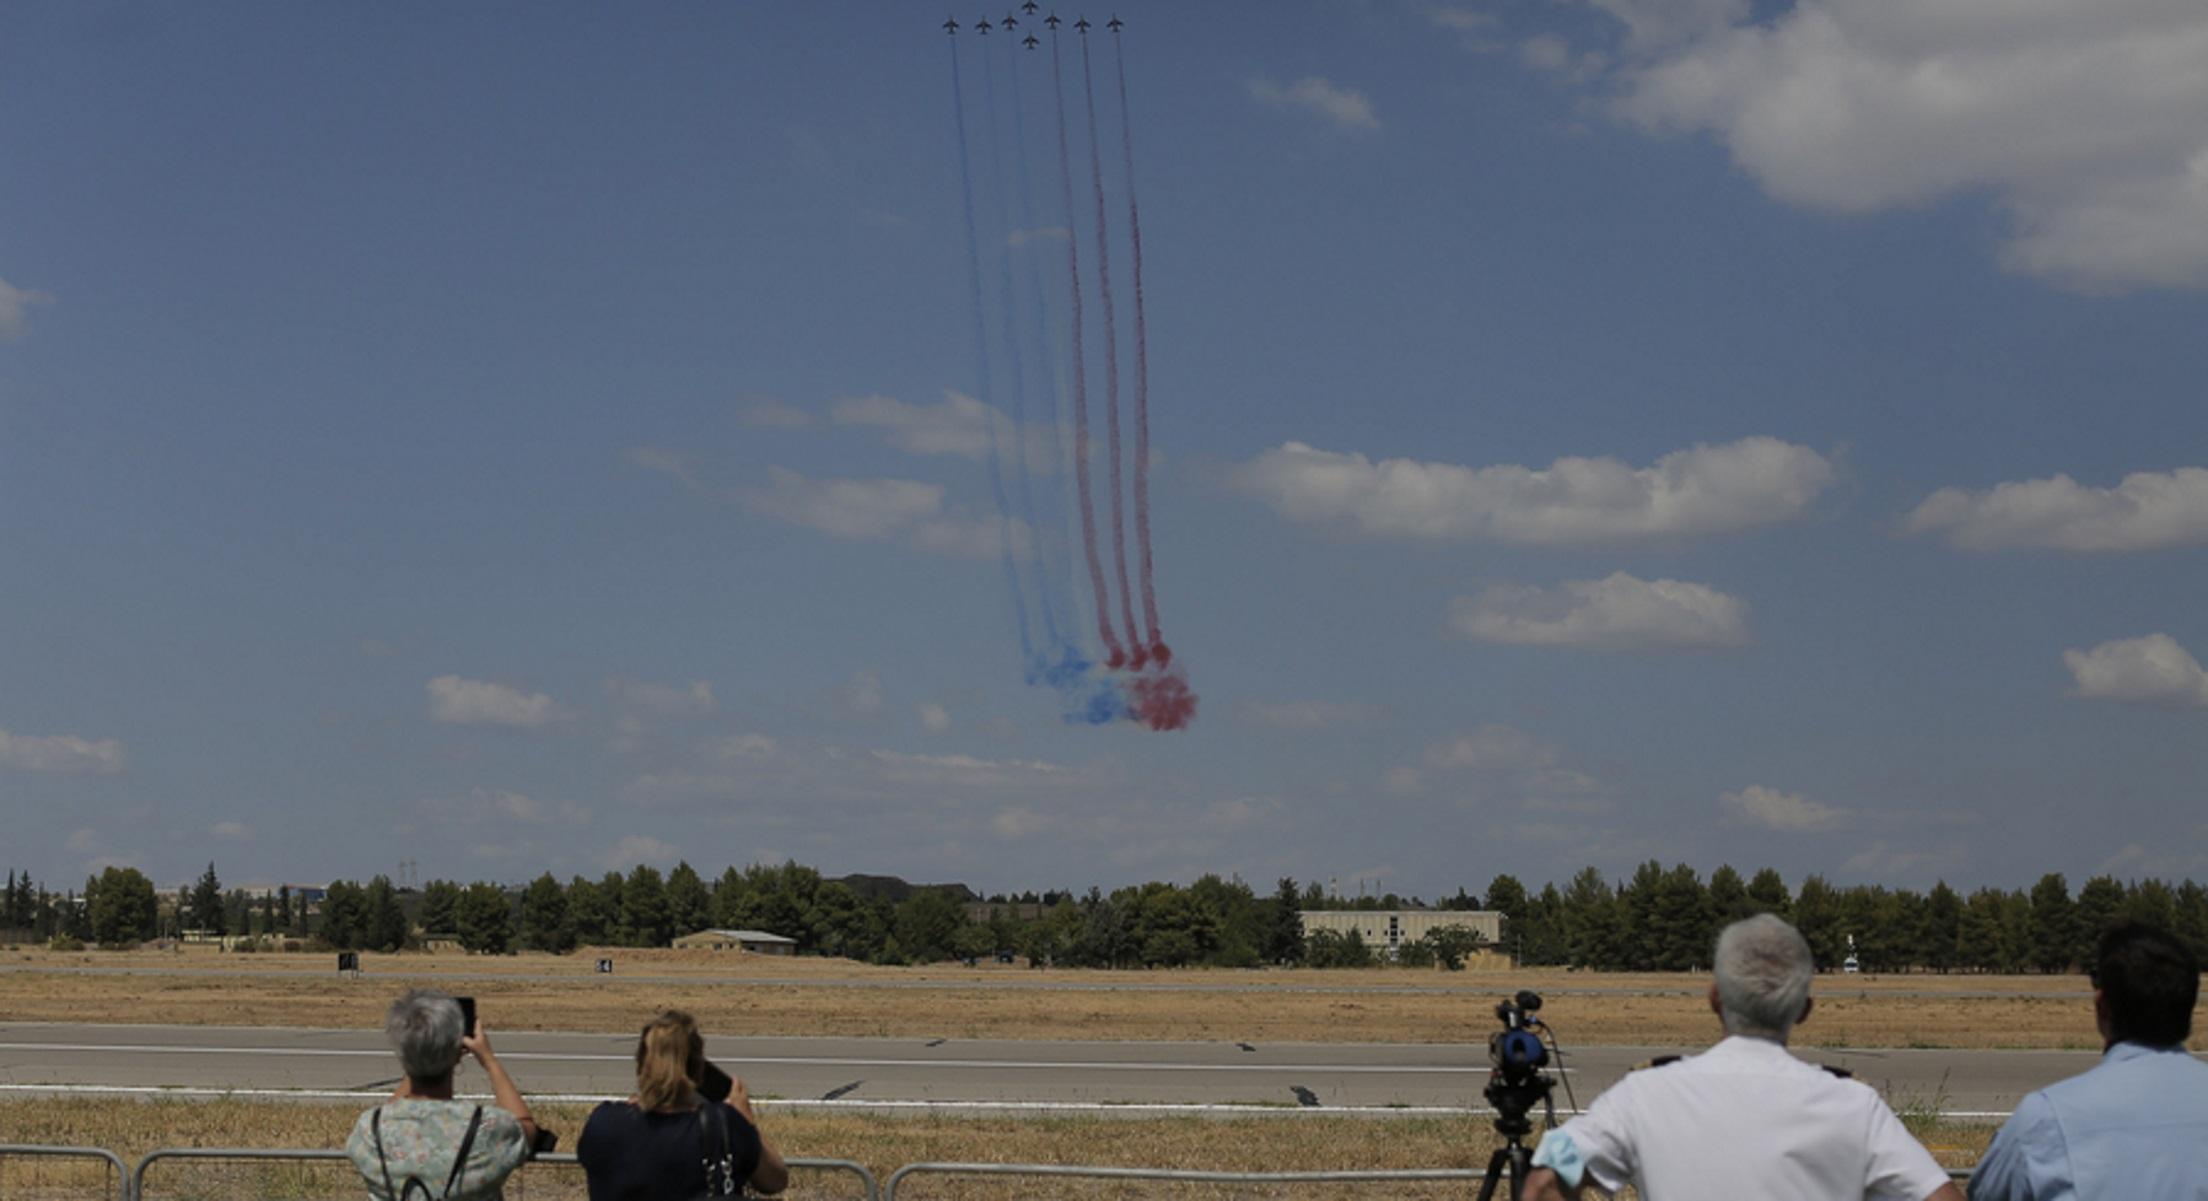 Rafale: Οι Γάλλοι «έδωσαν μια πρώτη γεύση» ενόψει Athens Flying Week – Δείτε πλάνα!